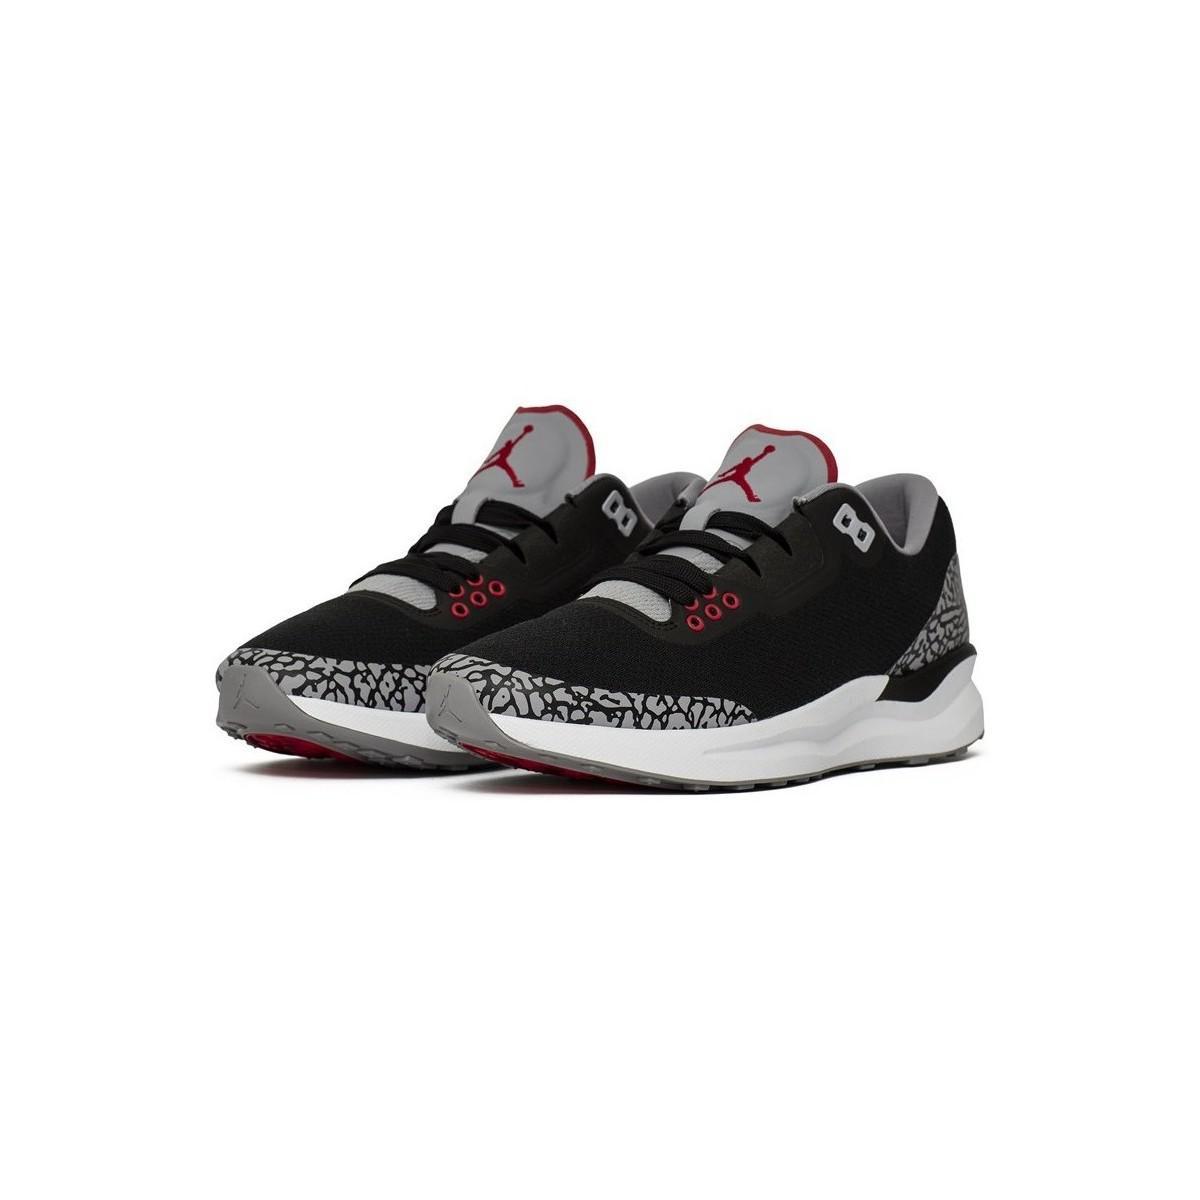 Nike - Jordan Zoom Tenacity 88 Men s Shoes (trainers) In Black for Men -.  View fullscreen 9af634efc